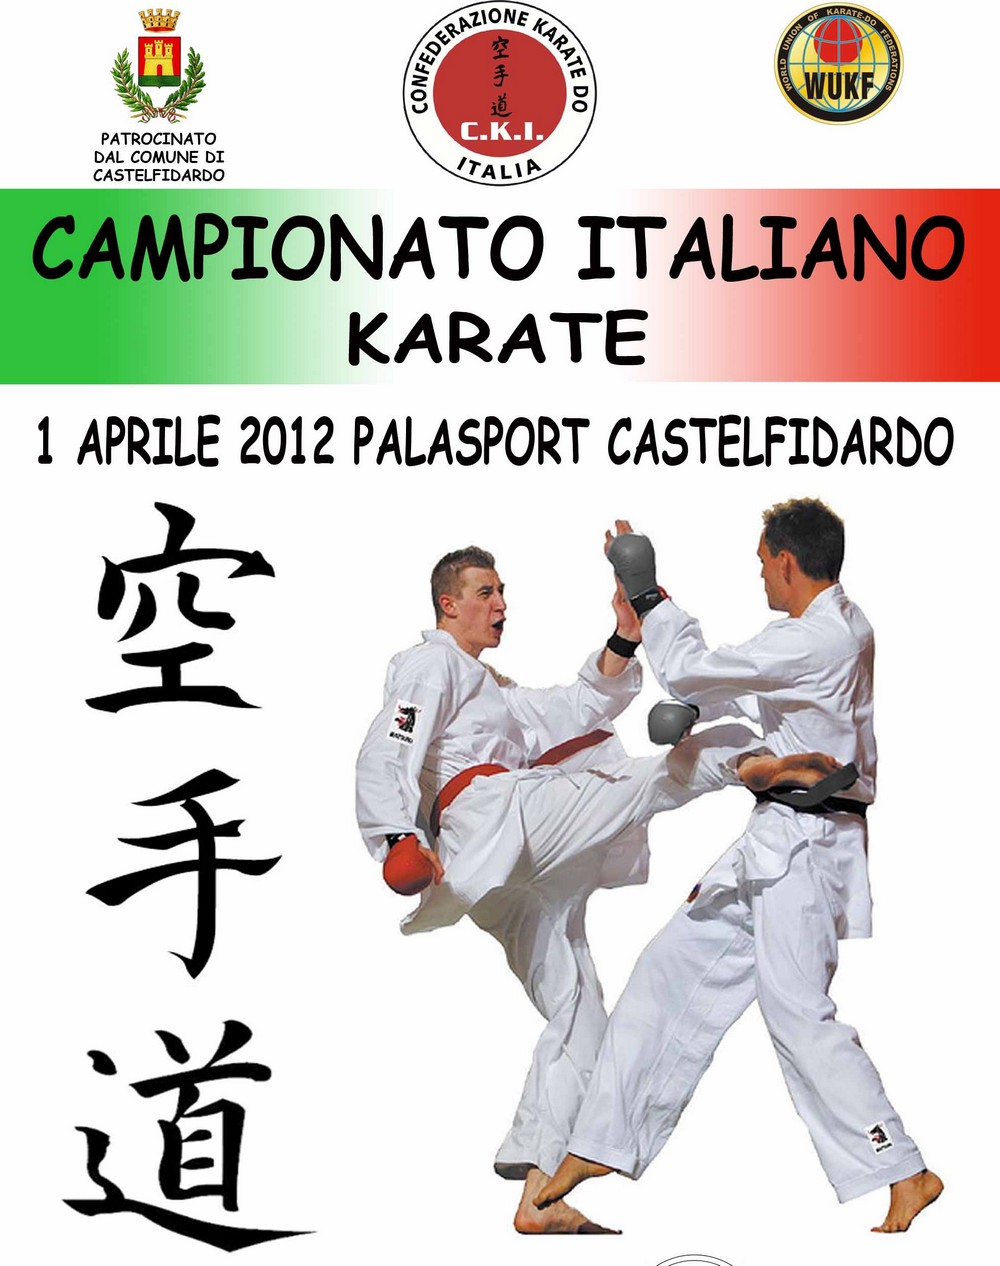 Campionati italiani di karate al Palaolimpia